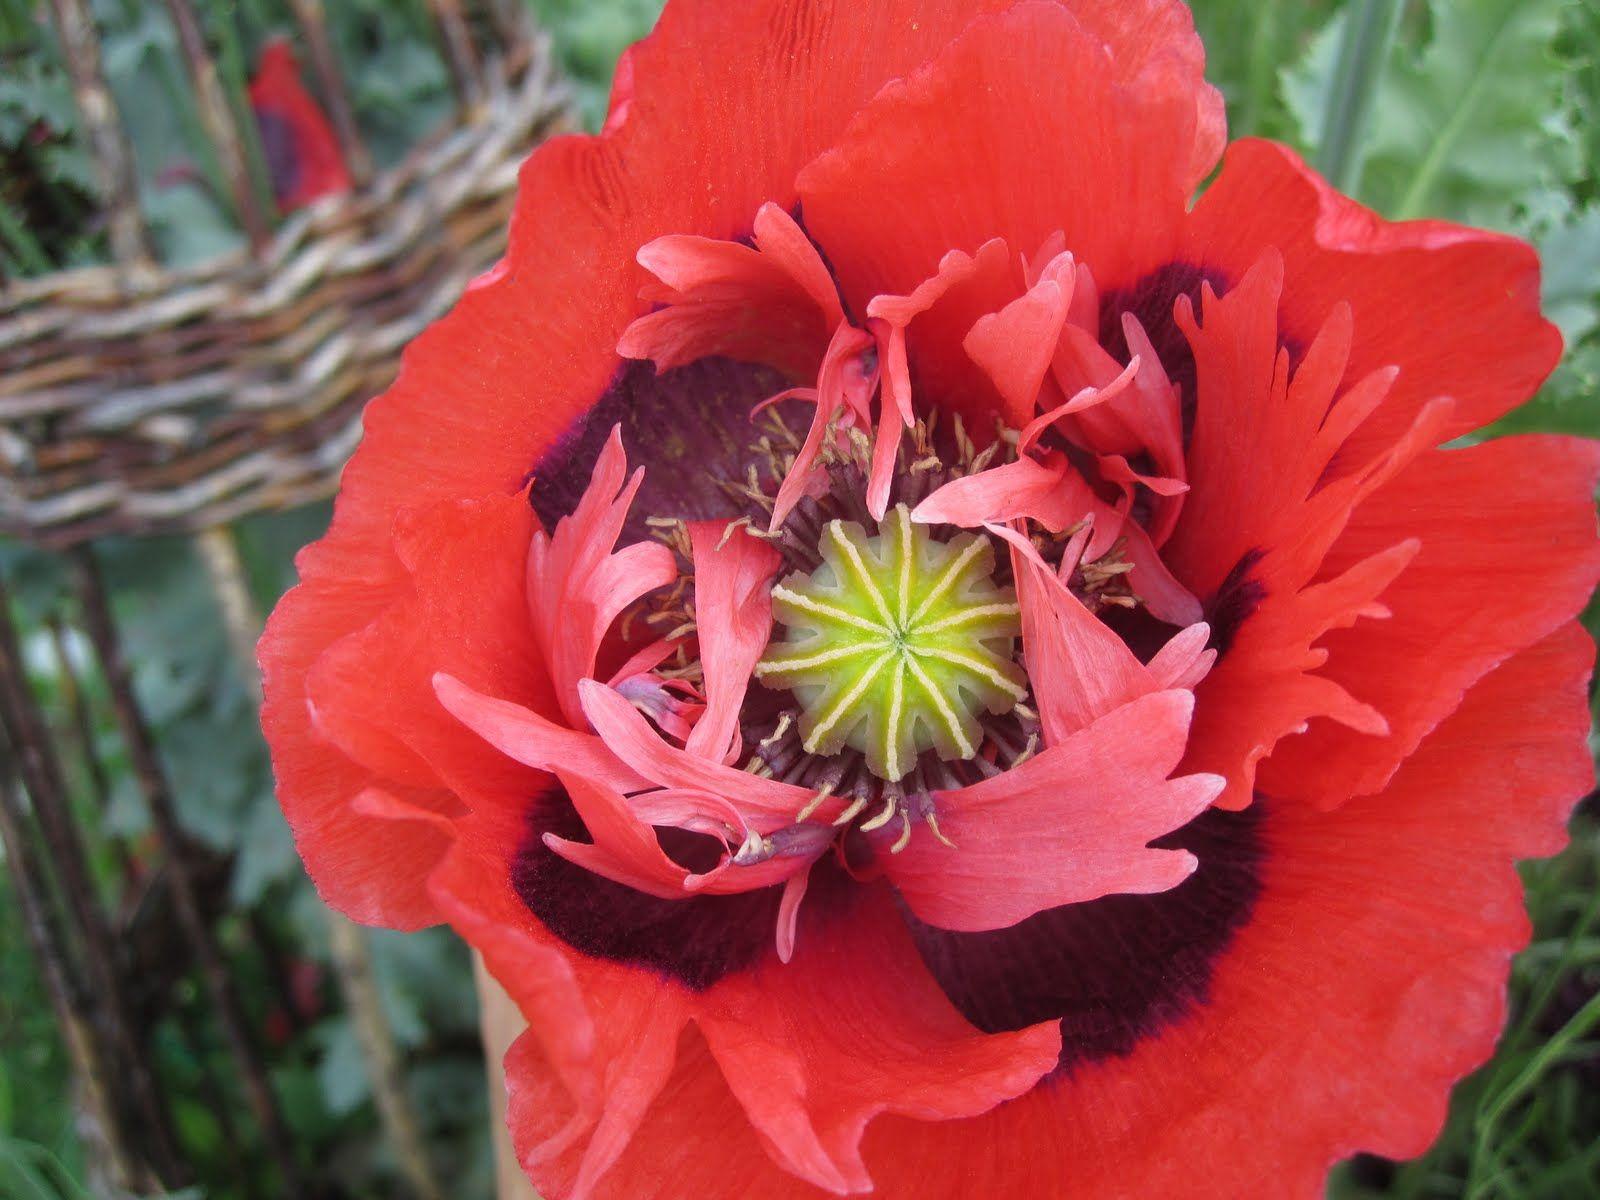 Opium Poppy Flower Flora Of Europe Pinterest Flora